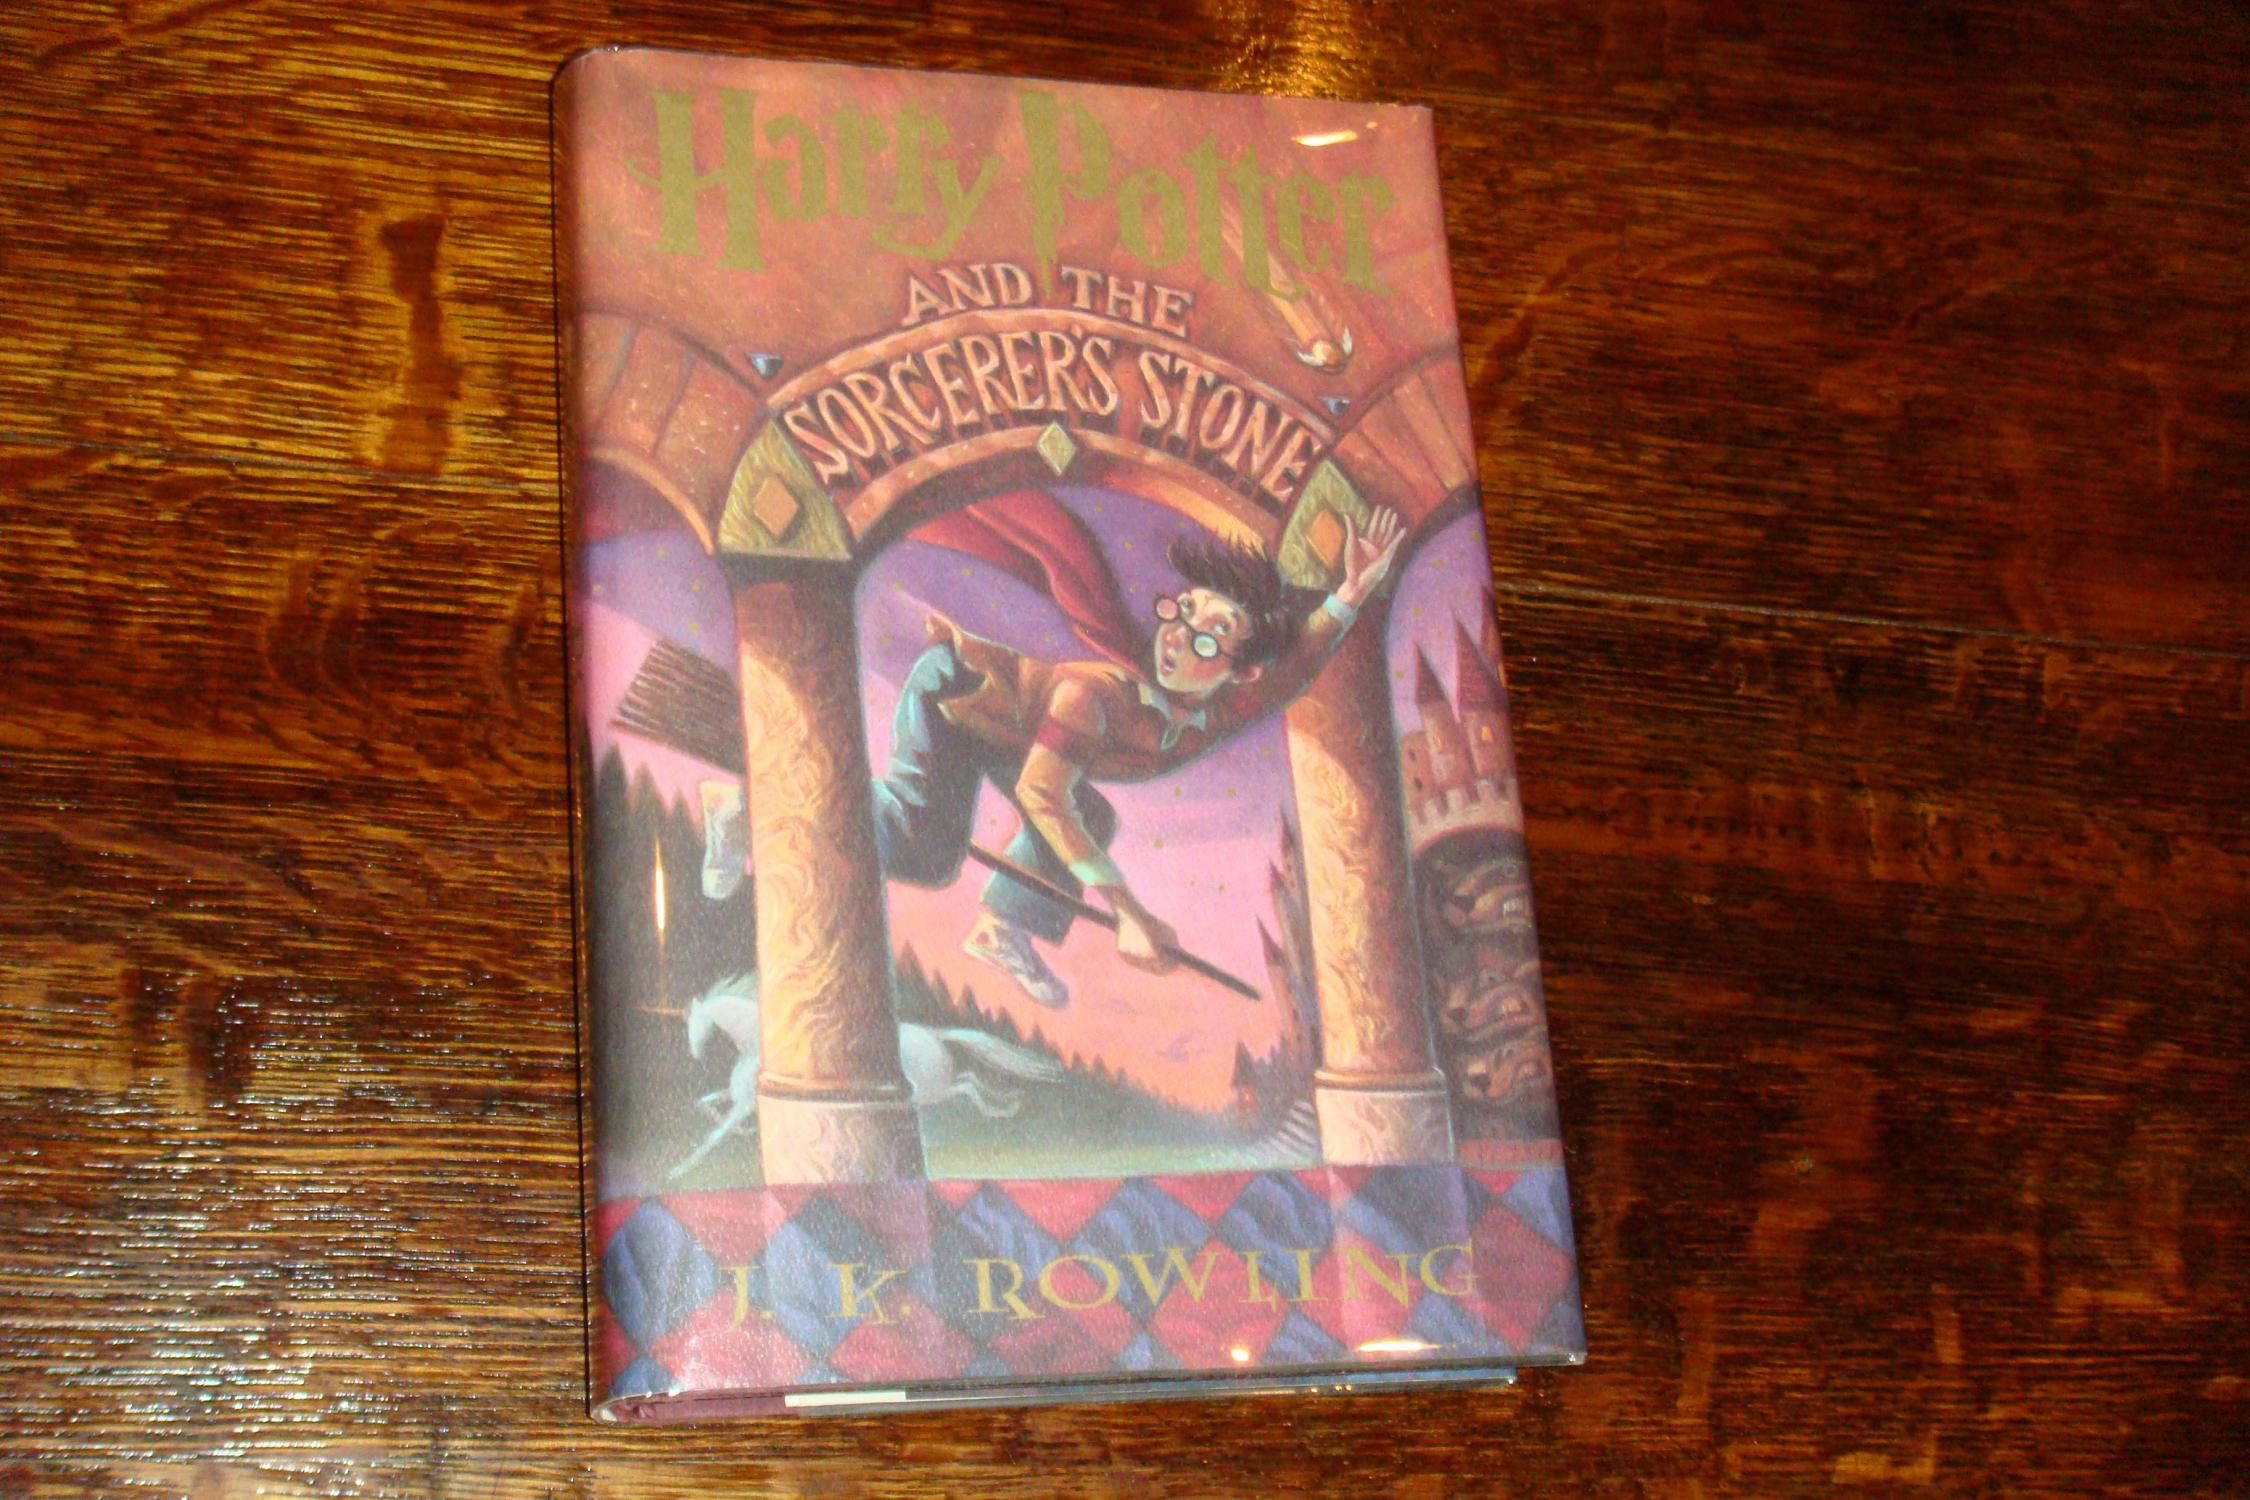 book report of harry potter and the sorcerers stone In 2001, chris columbus released harry potter and the sorcerer's stone, based on the 1997 novel harry potter and the philosopher's stone by j k rowling starring daniel radcliffe, rupert grint, emma watson, john cleese, robbie coltrane, warwick davis, richard griffiths, richard harris, ian hart, john hurt, alan rickman, fiona shaw, maggie.